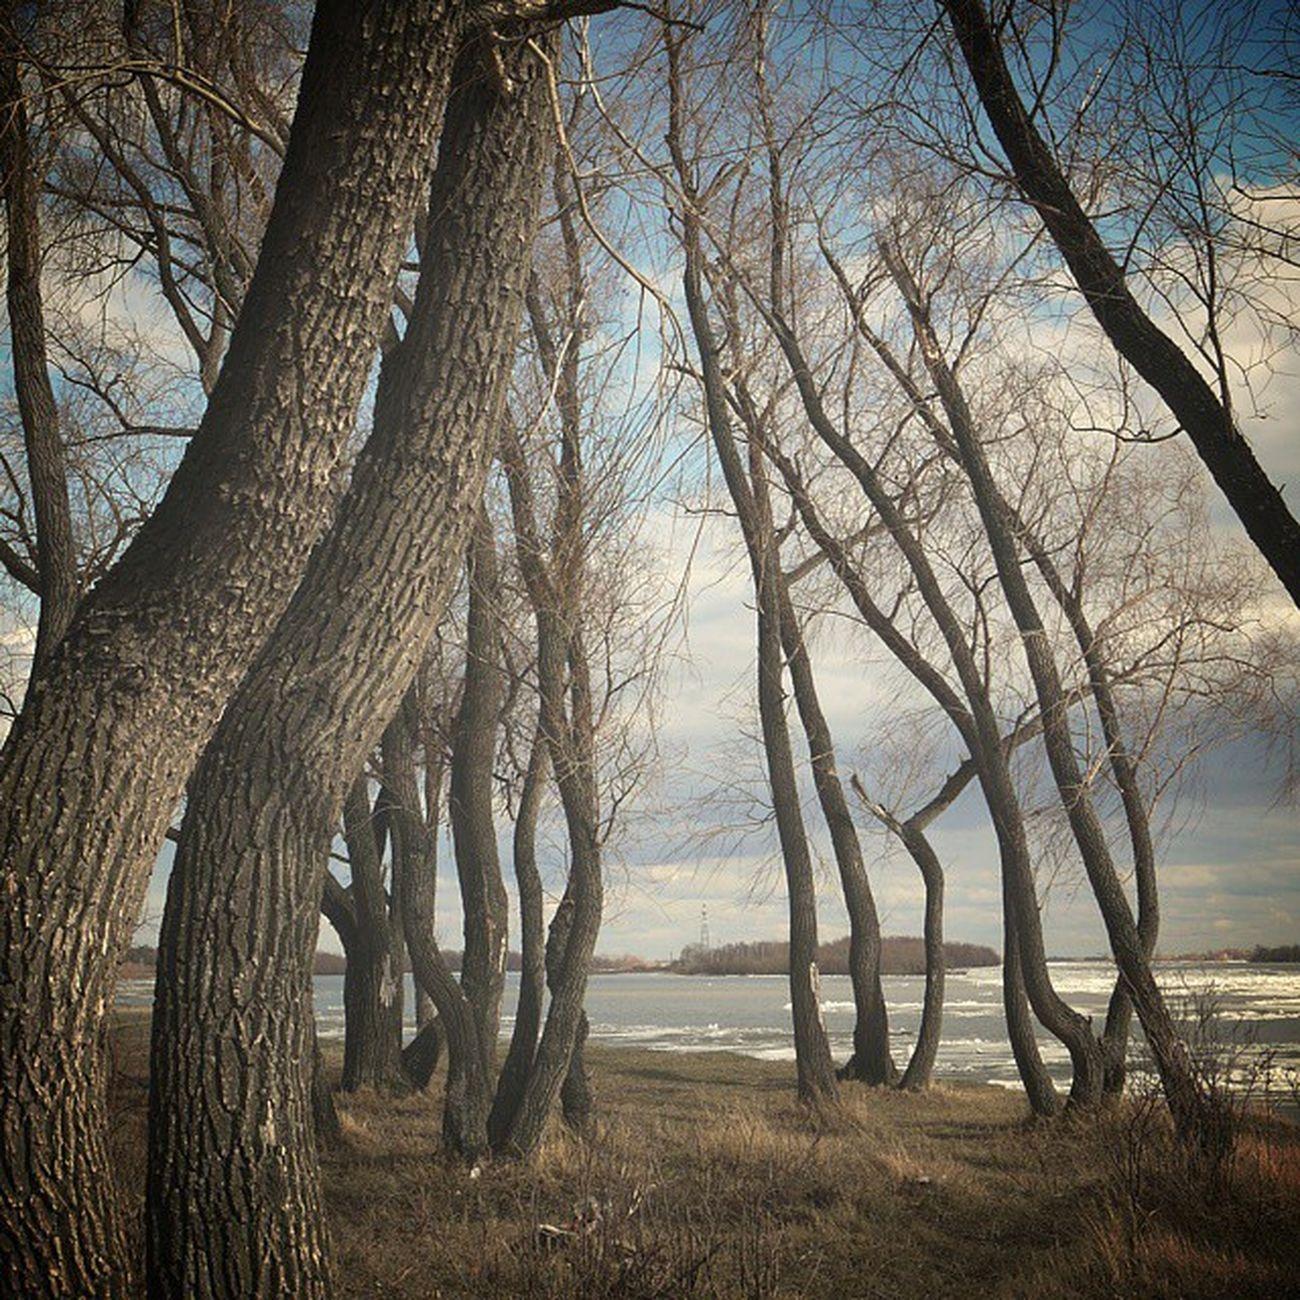 Omsk Siberia Debacle Spring April Tree Panasonic_g3 омск сибирь весна ледоход апрель  панасоник